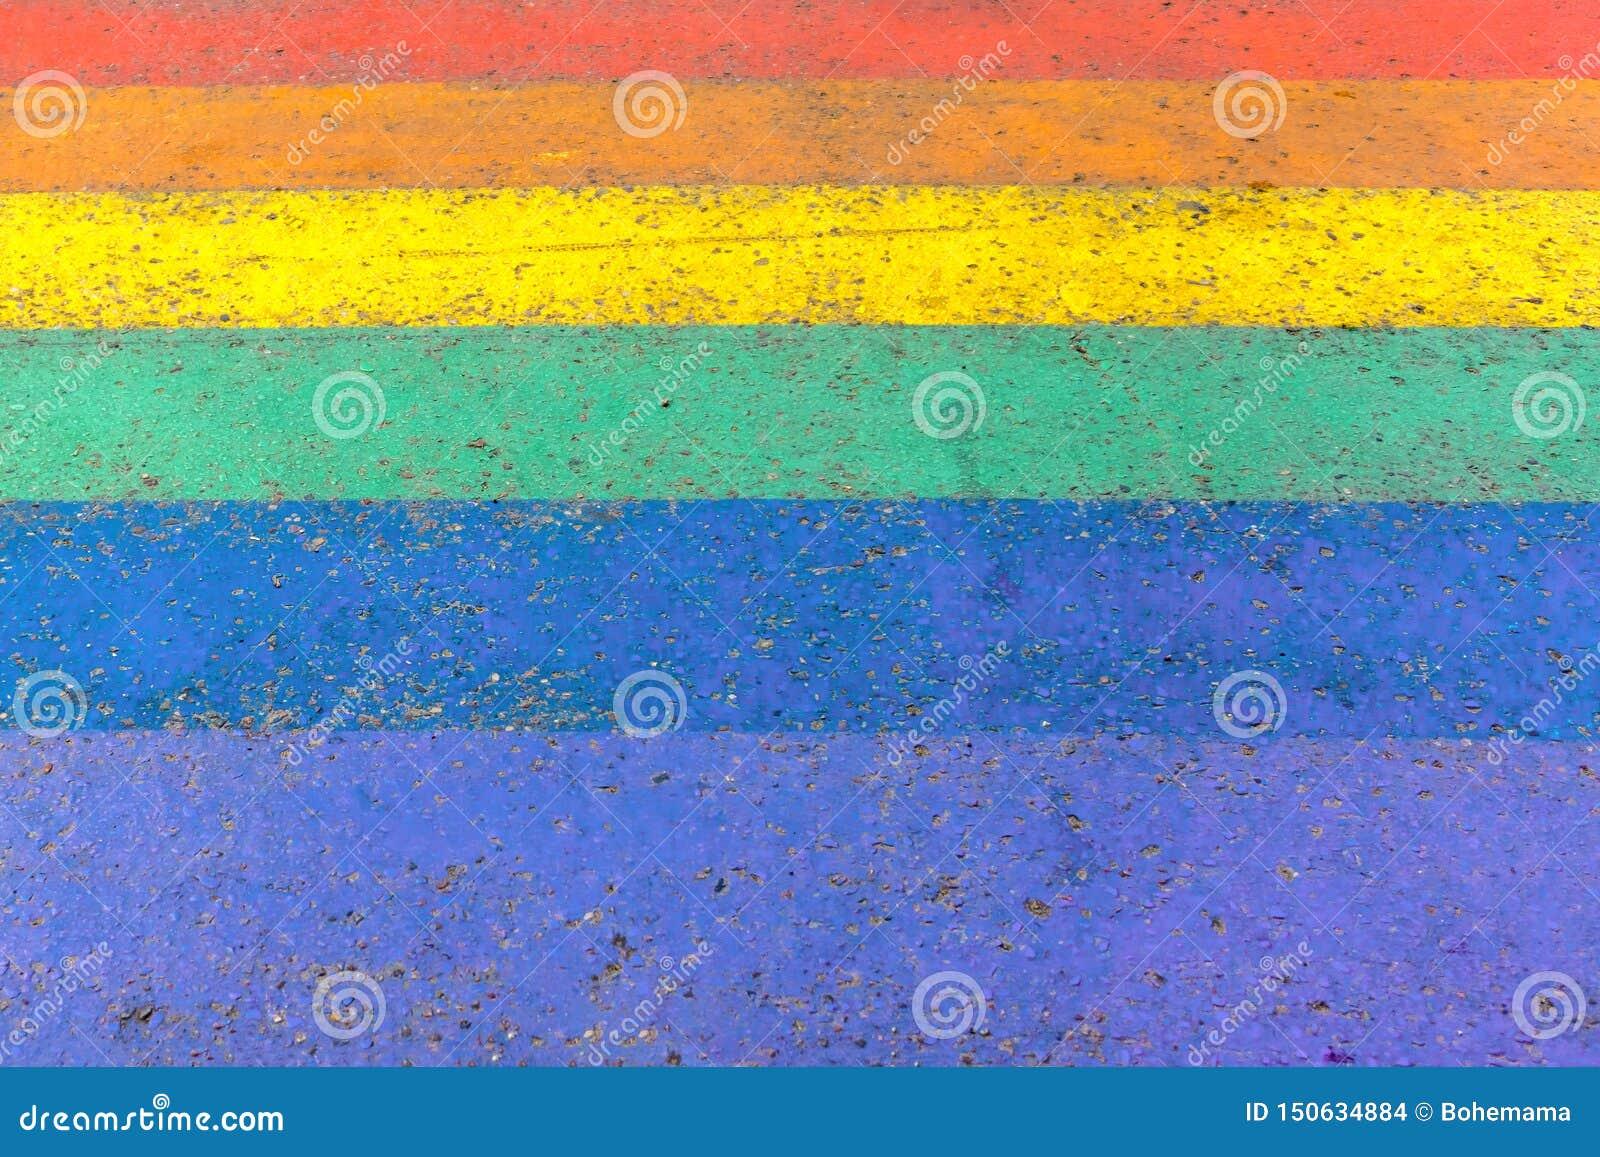 Crossing in street of LGBTQI or LGBT rainbow pride flag colors as background